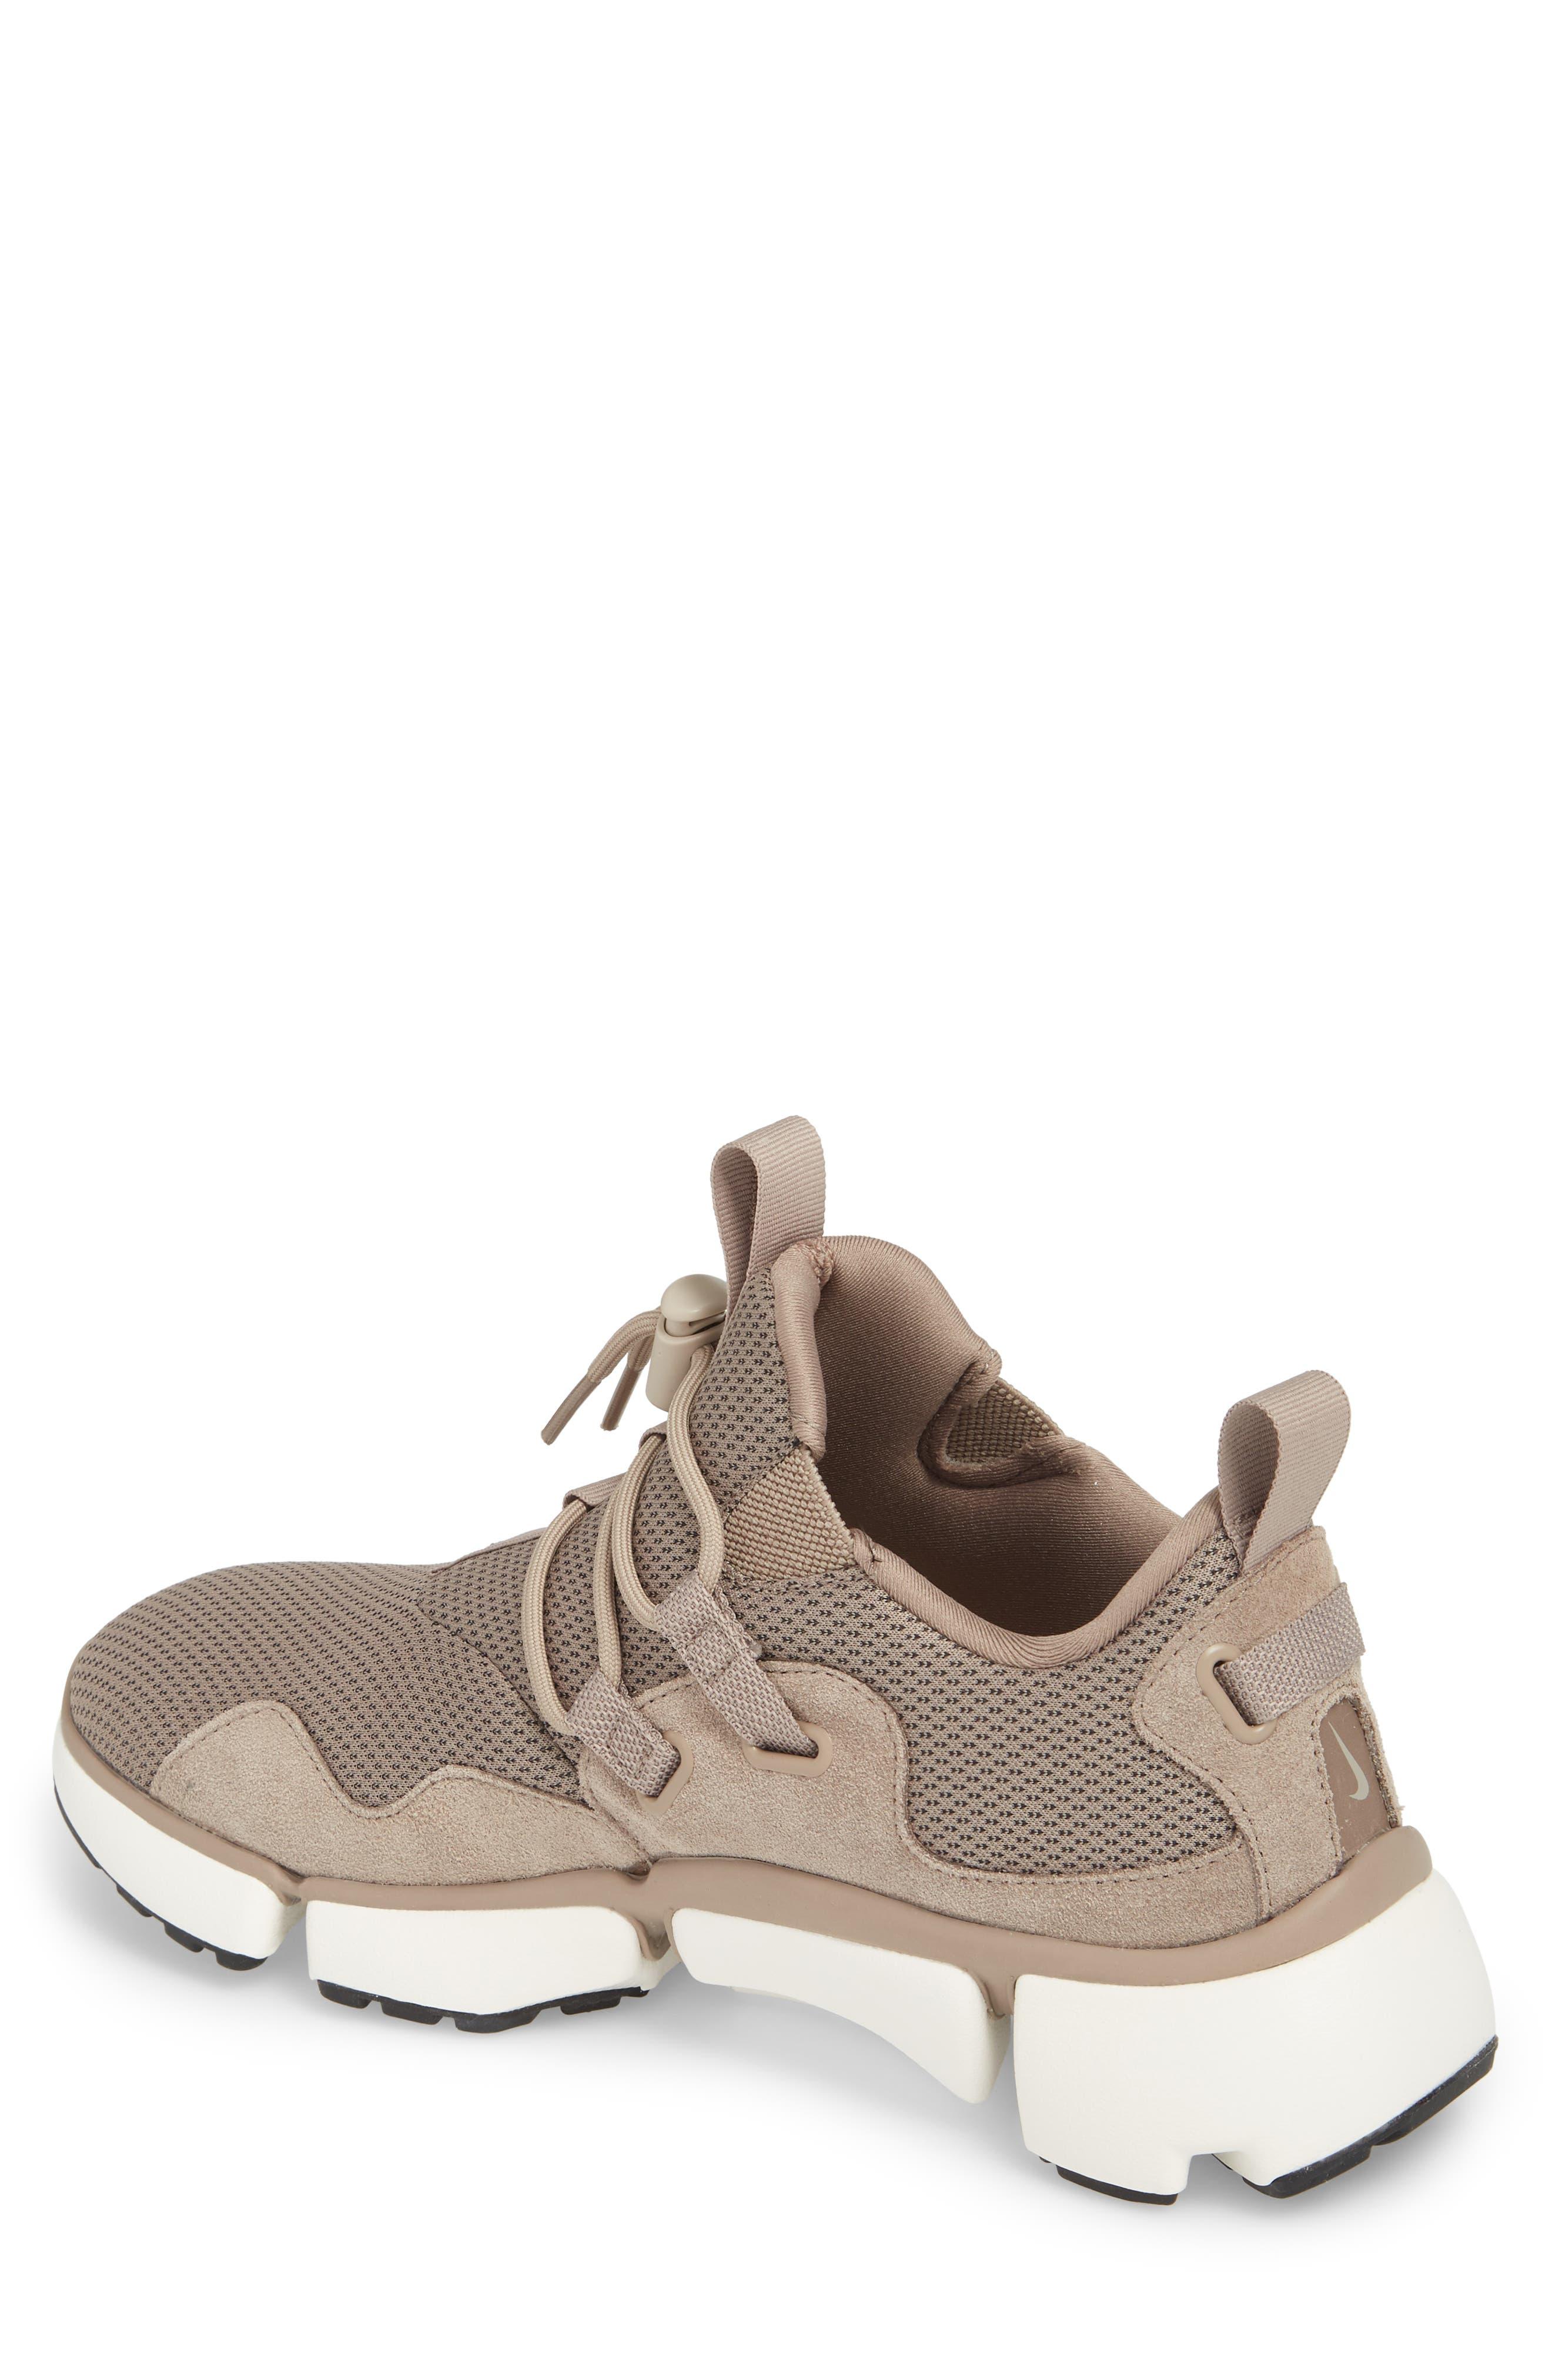 PocketKnife DM SE Sneaker,                             Alternate thumbnail 2, color,                             Sepia Stone/ Sail/ Black